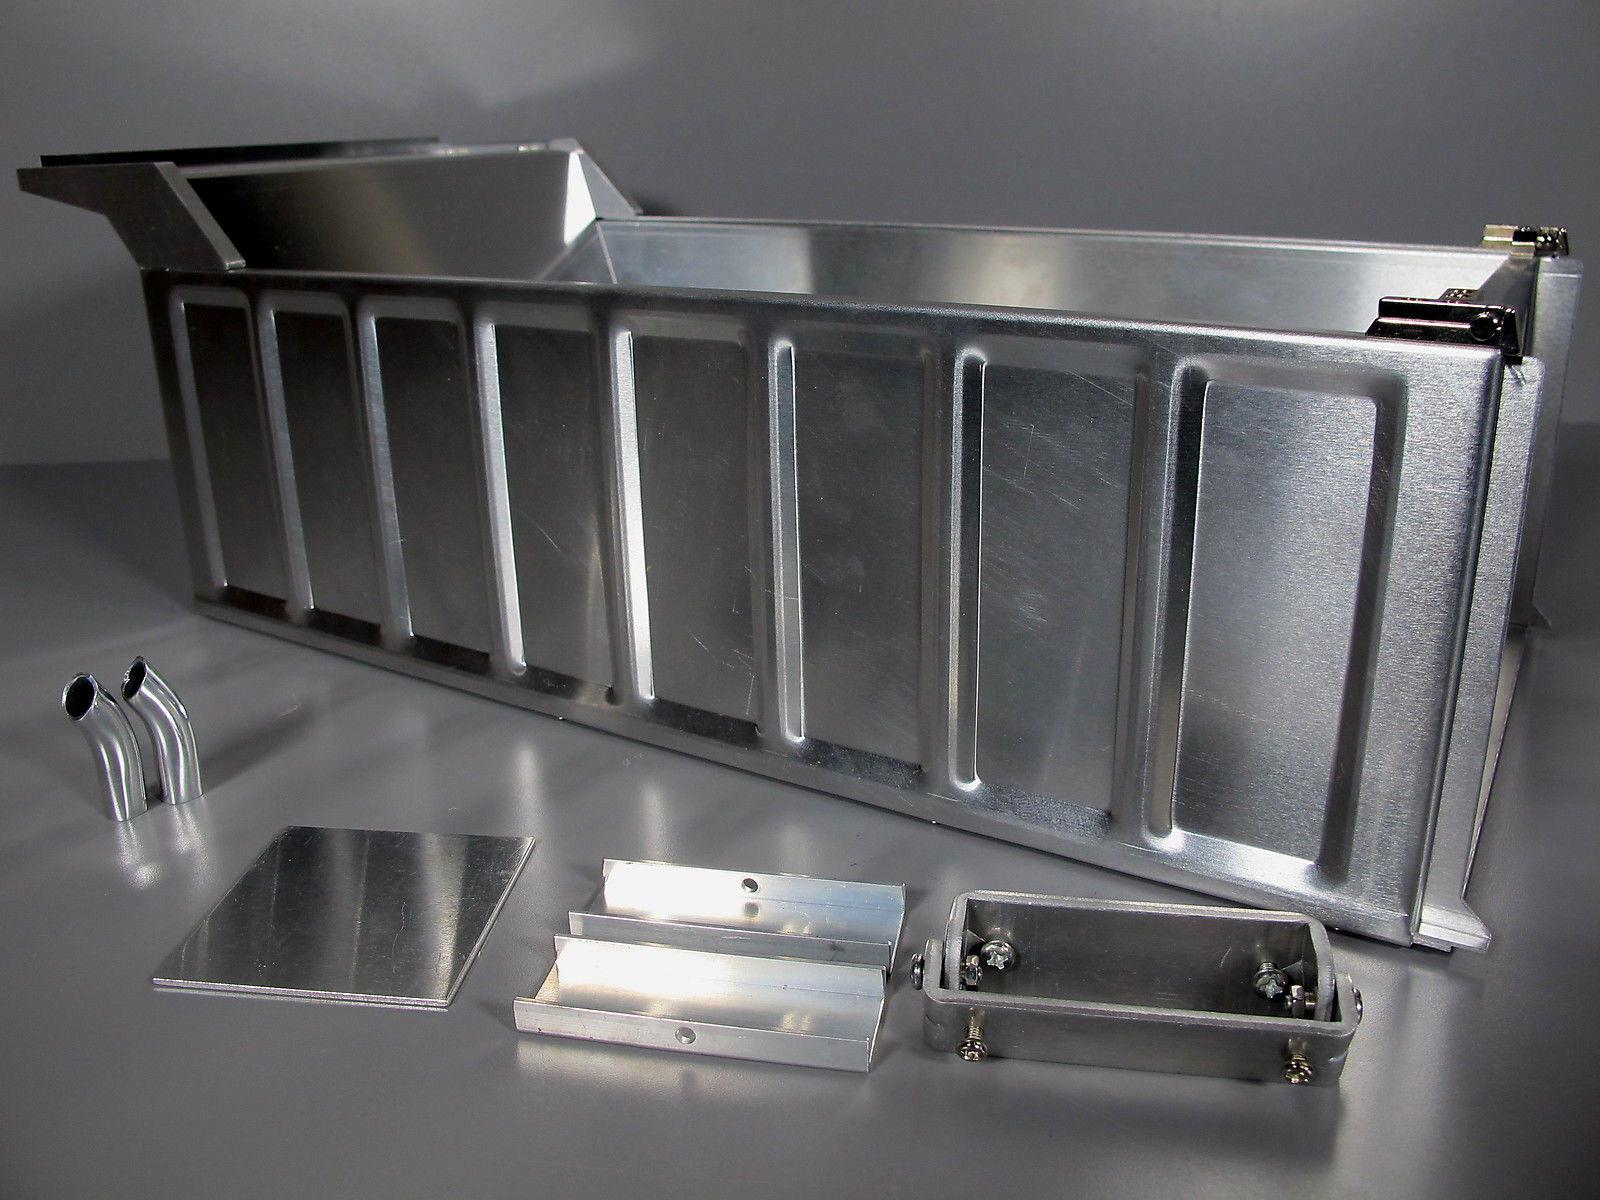 Nuovo Aluminum Dump Bed Conversion Kit Tamiya 1/14 R/C King Grand Hauler Aeromax